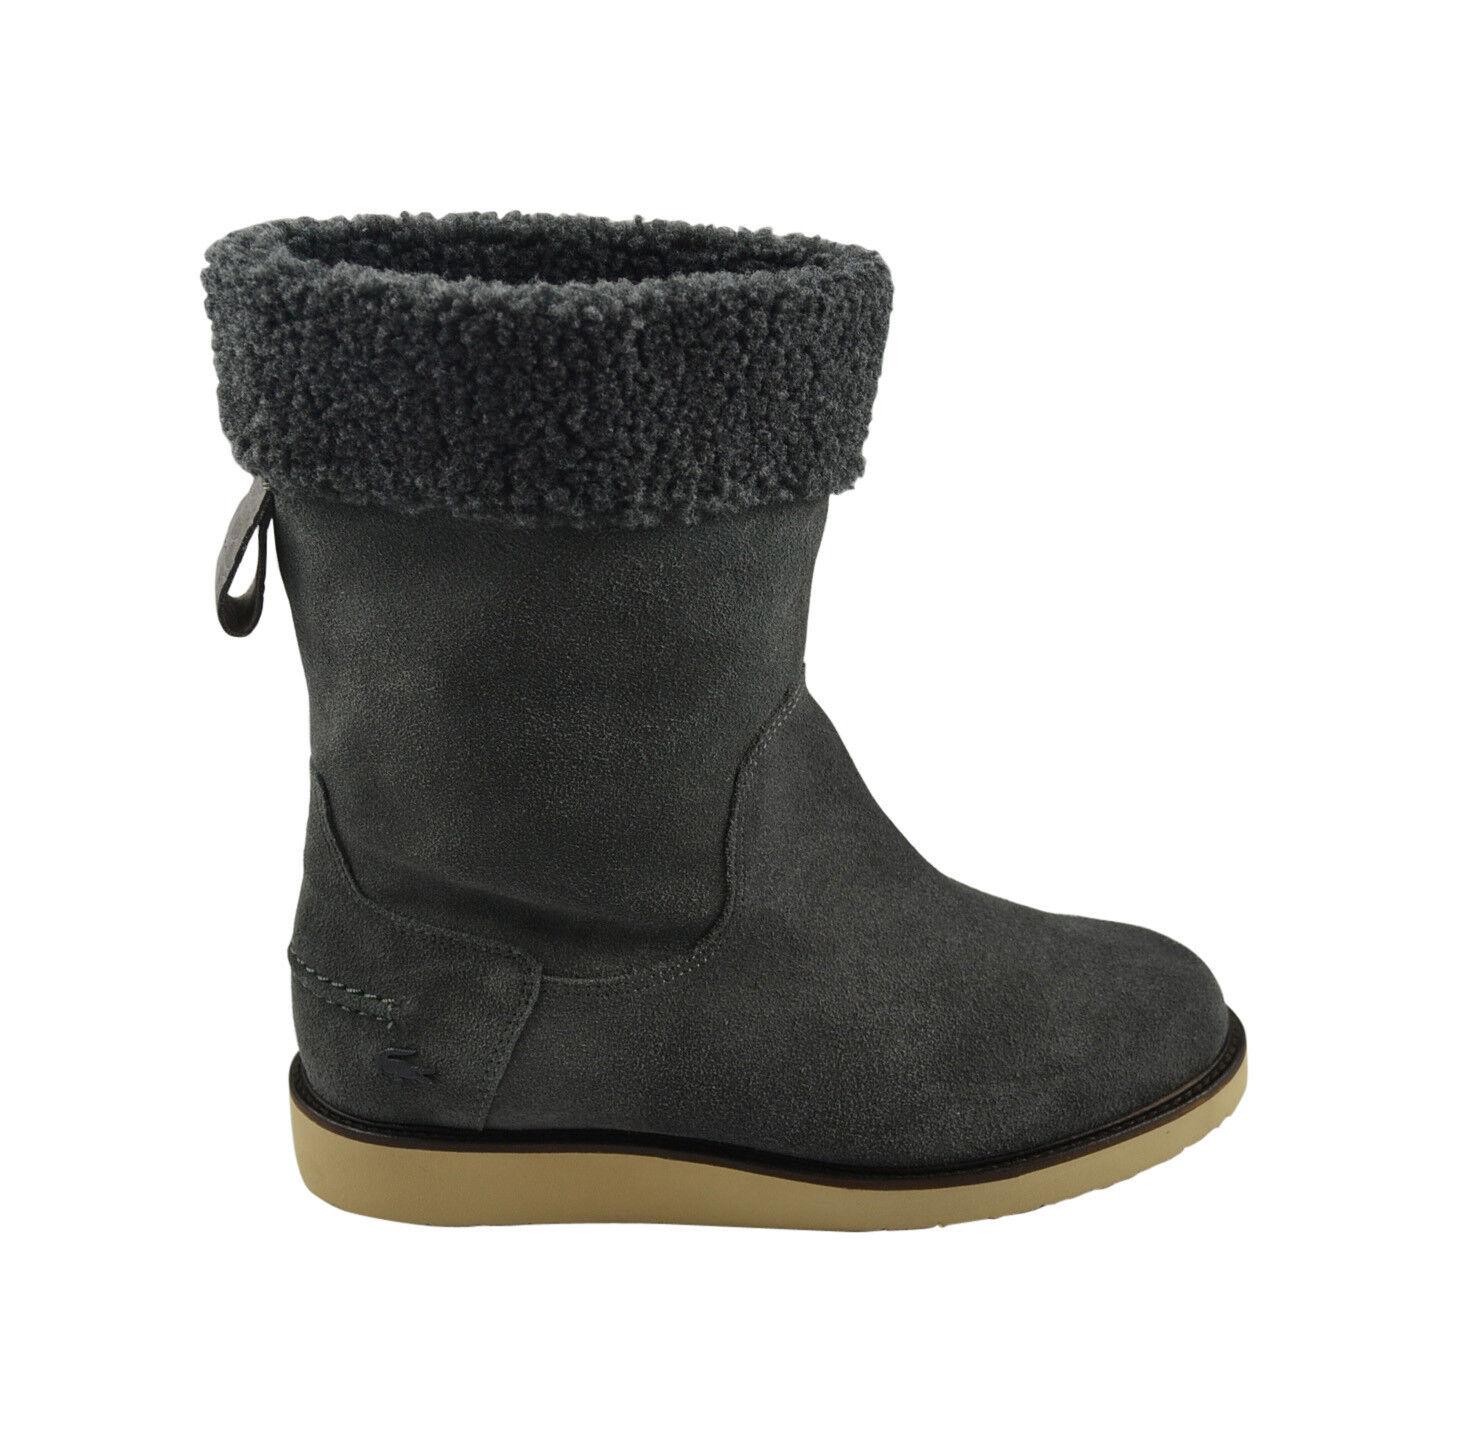 Lacoste ANSELL SRW Dark gris Bottes bottes gris